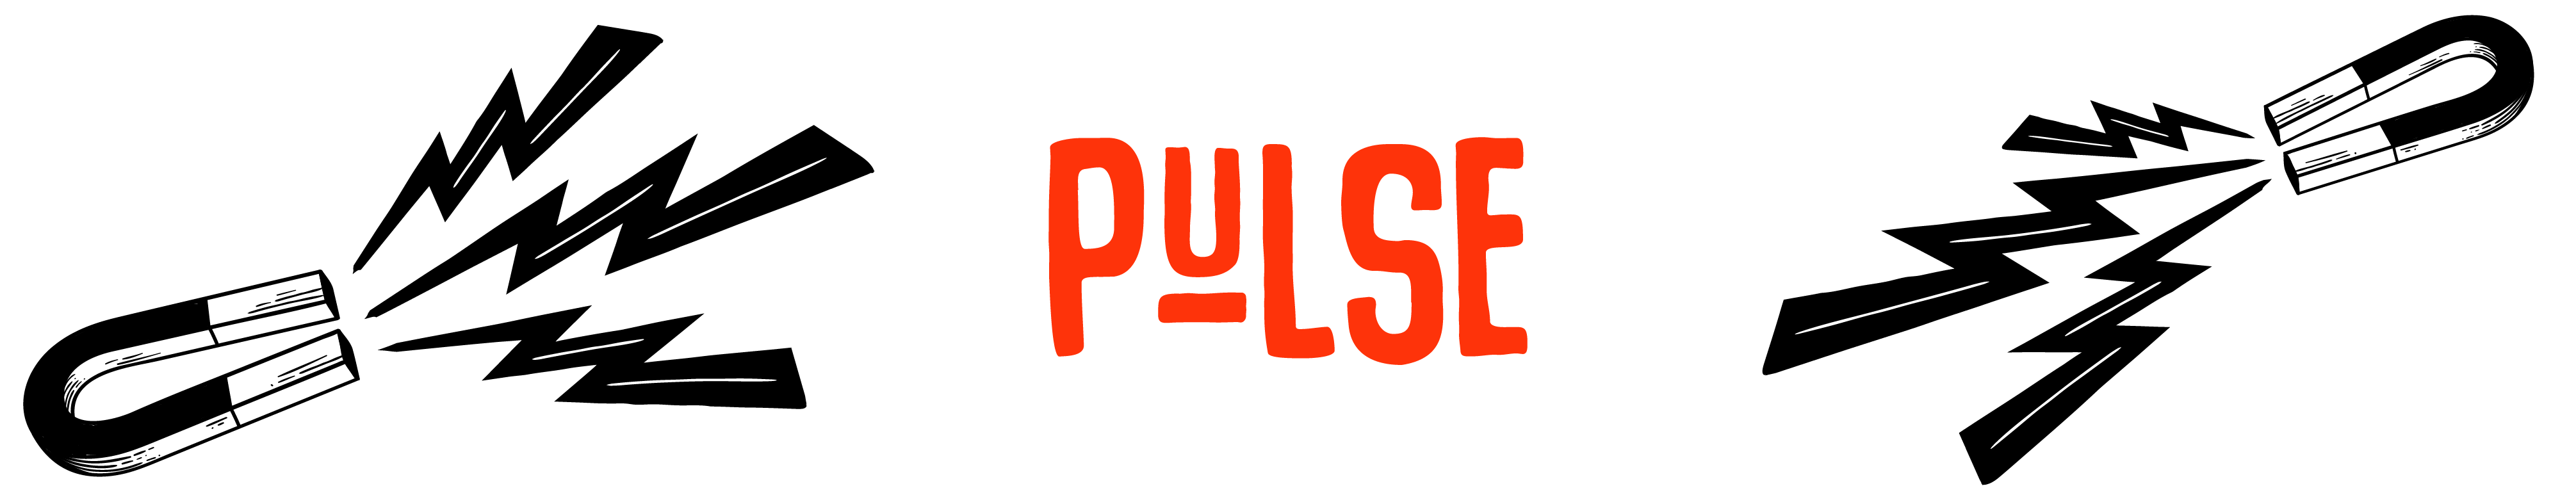 HARDI 2019 Annual Conference: Pulse